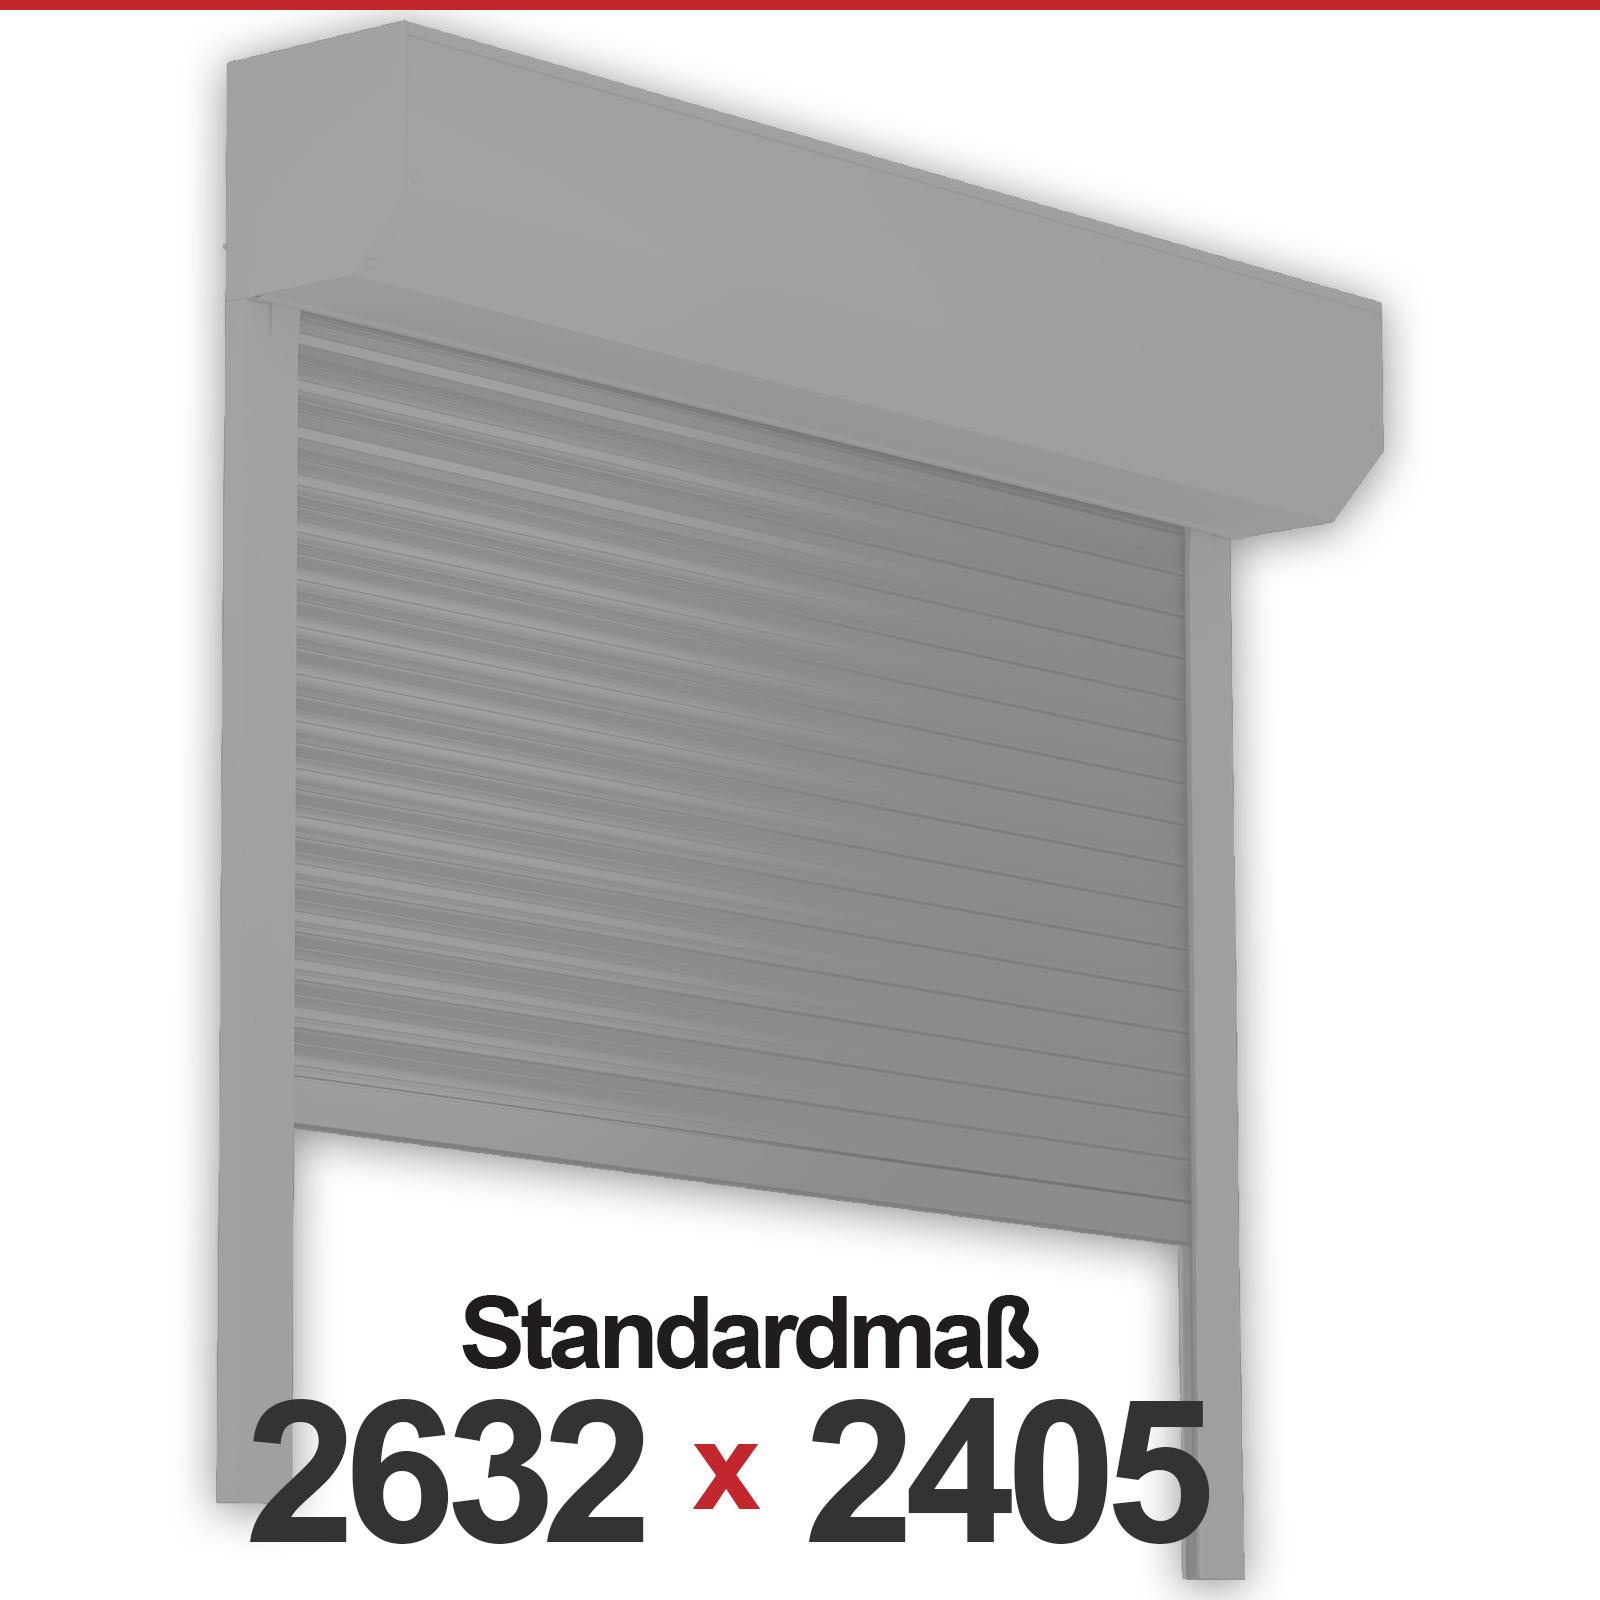 rolltore mit standardma rolltore profielemente24. Black Bedroom Furniture Sets. Home Design Ideas